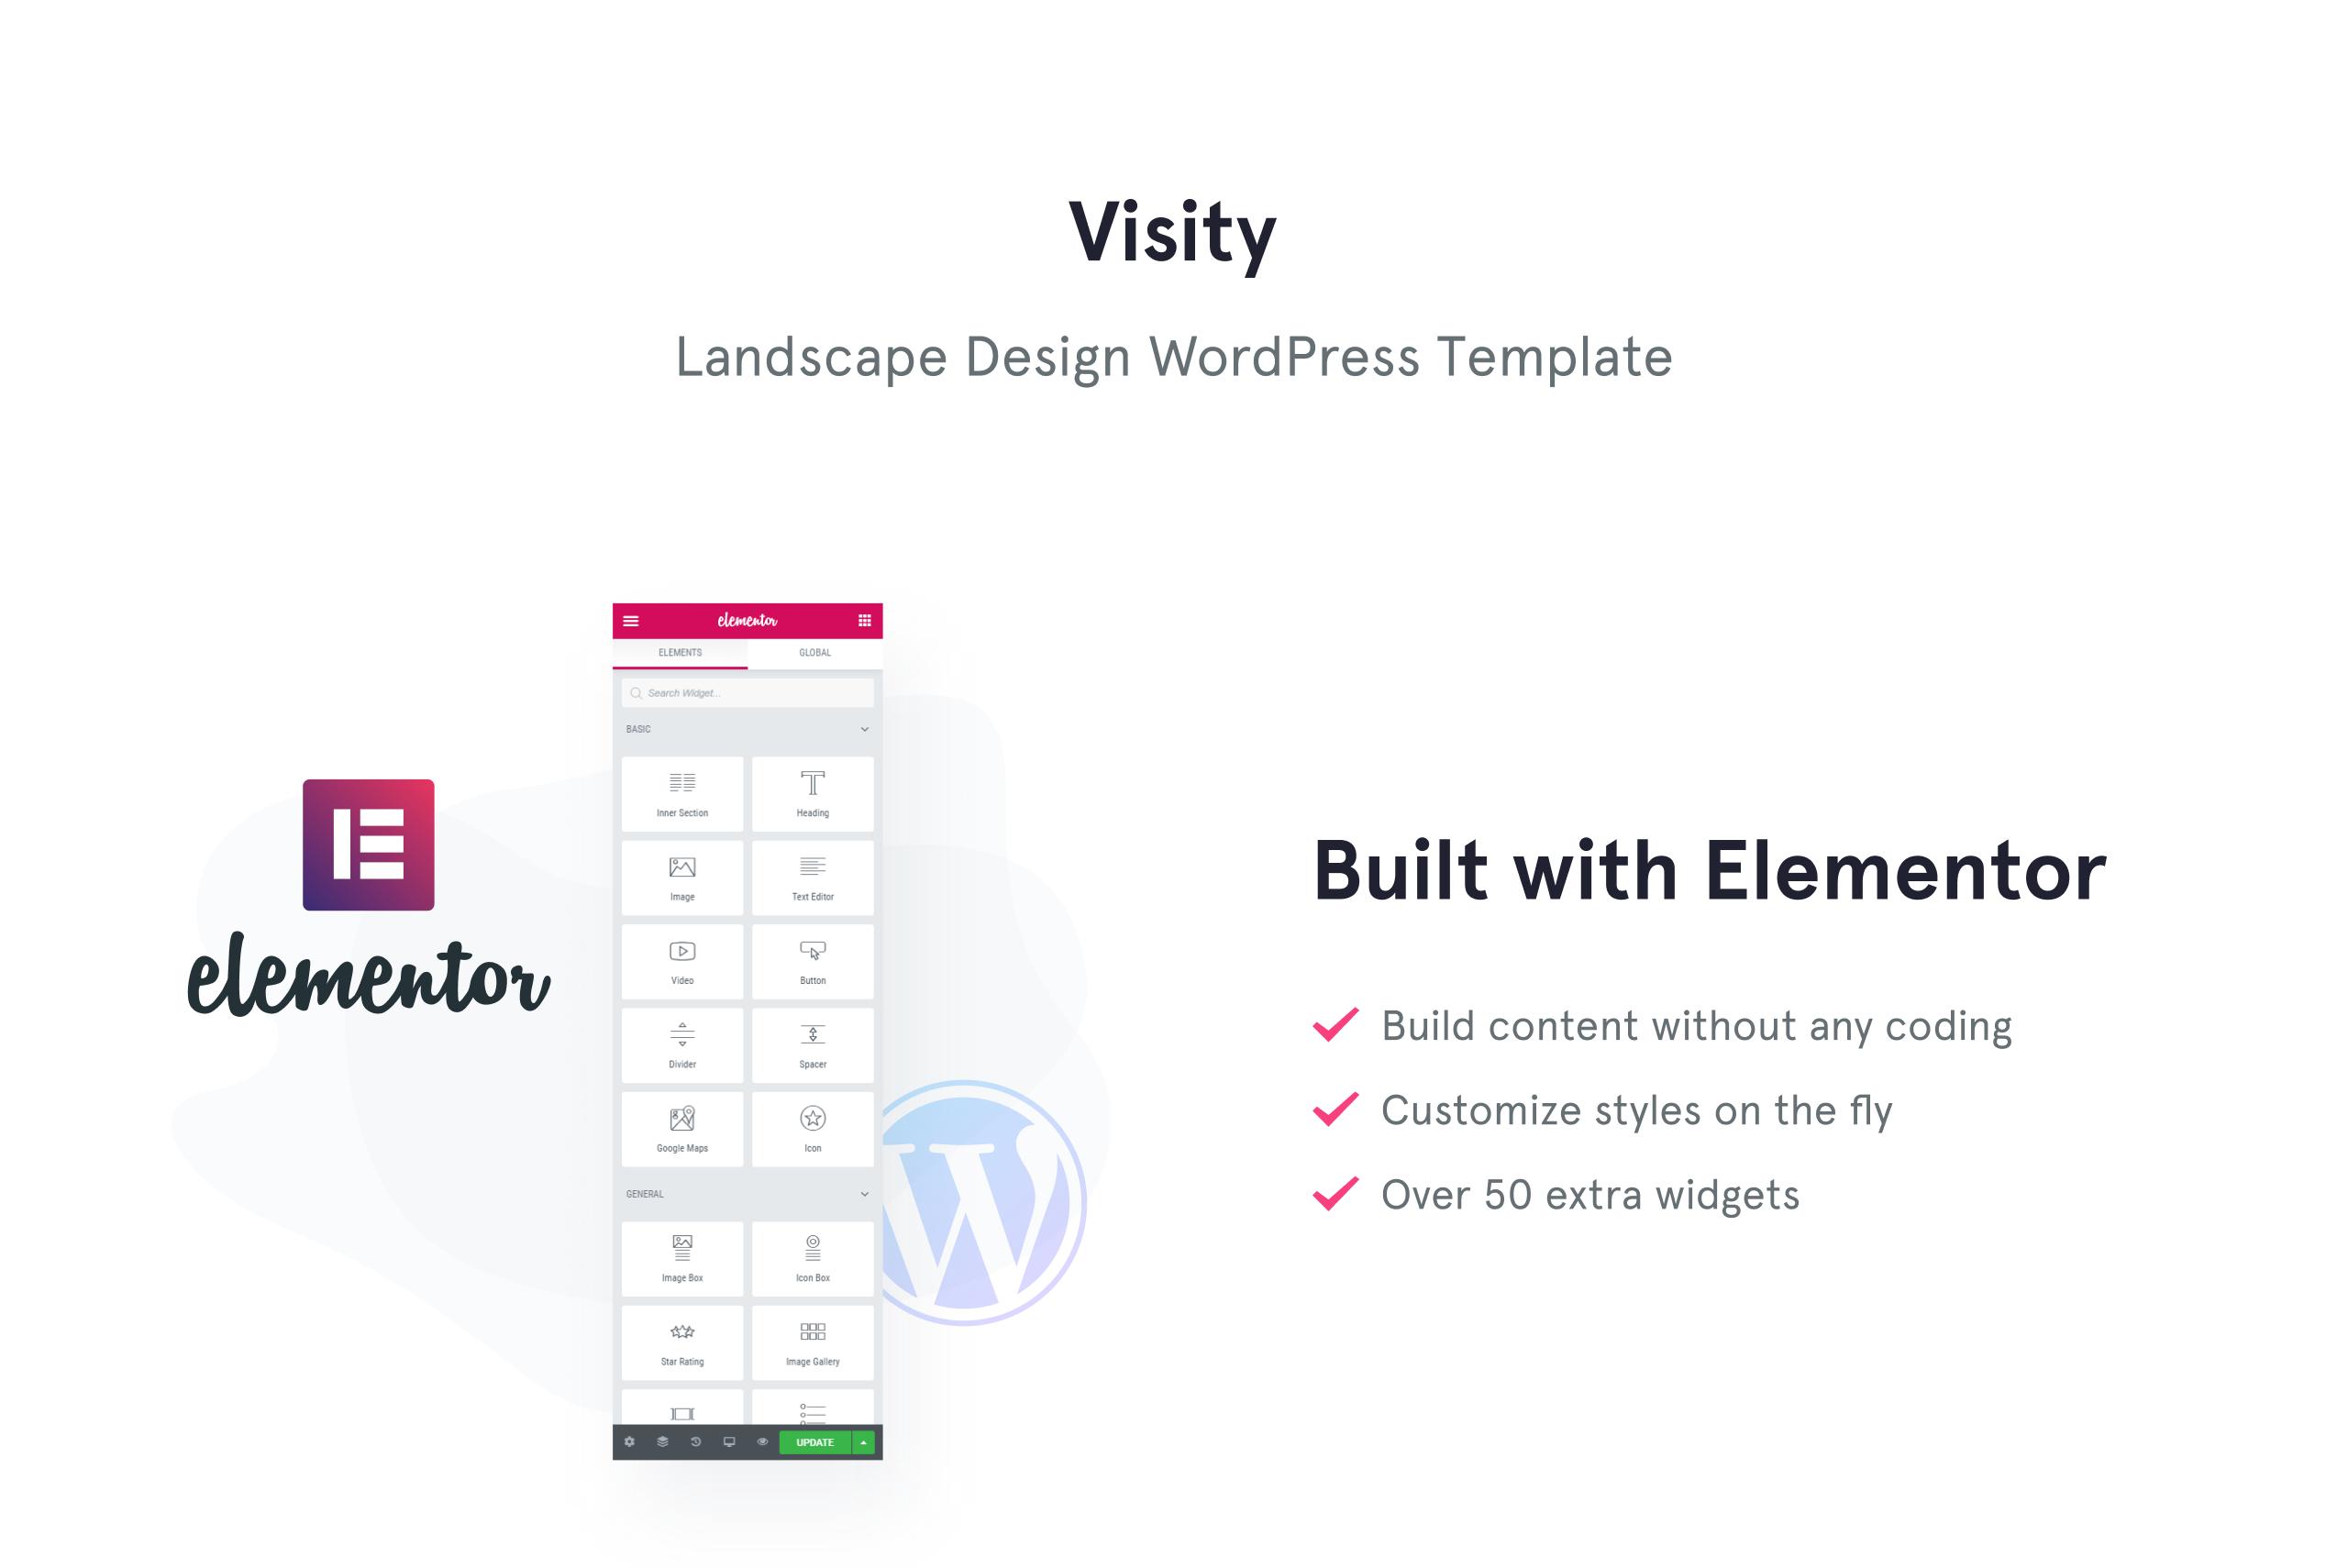 Visity - Landscape Design with Elementor WordPress Theme